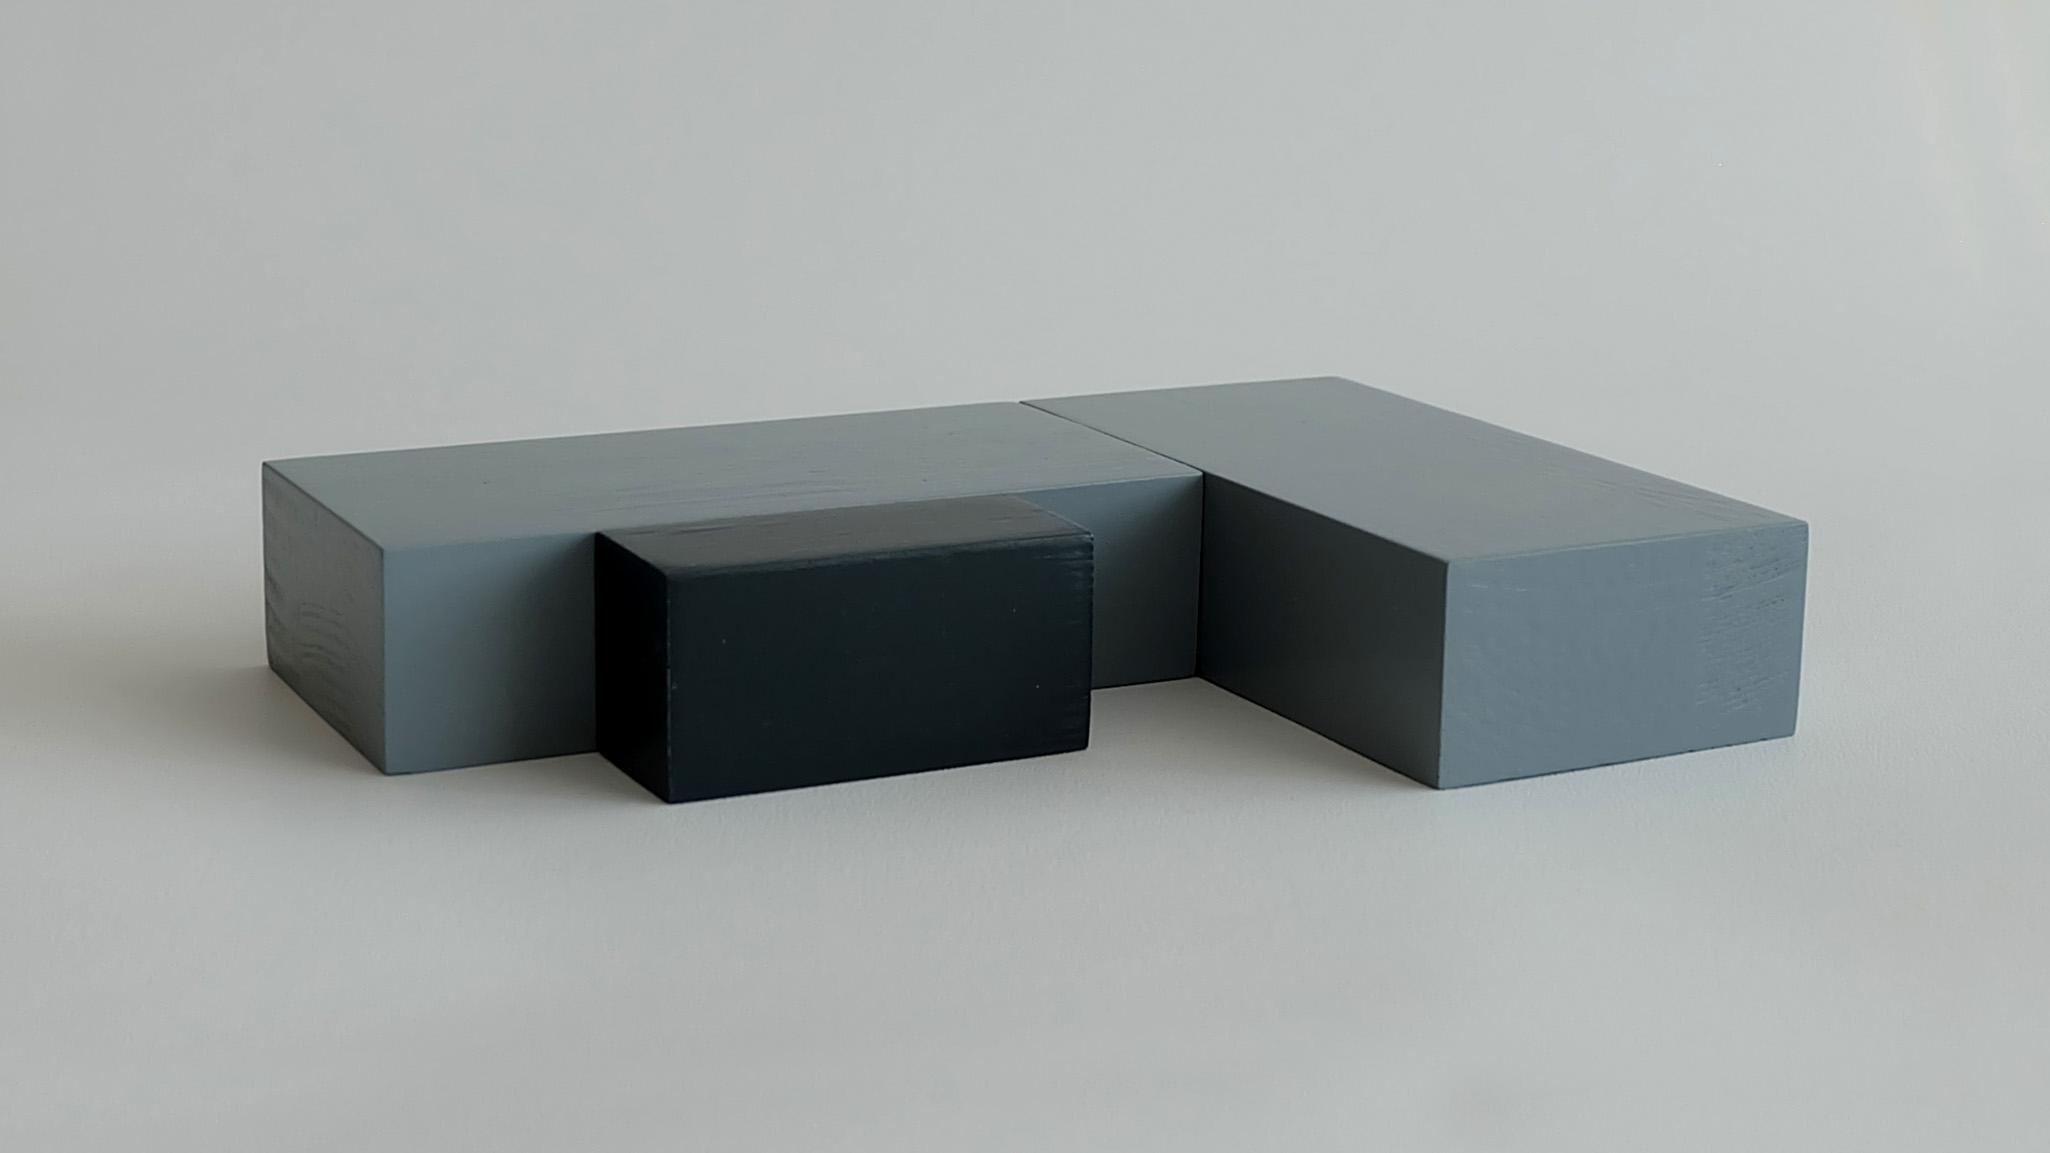 L19:  2 x One storey, flat roof + flat roof porch